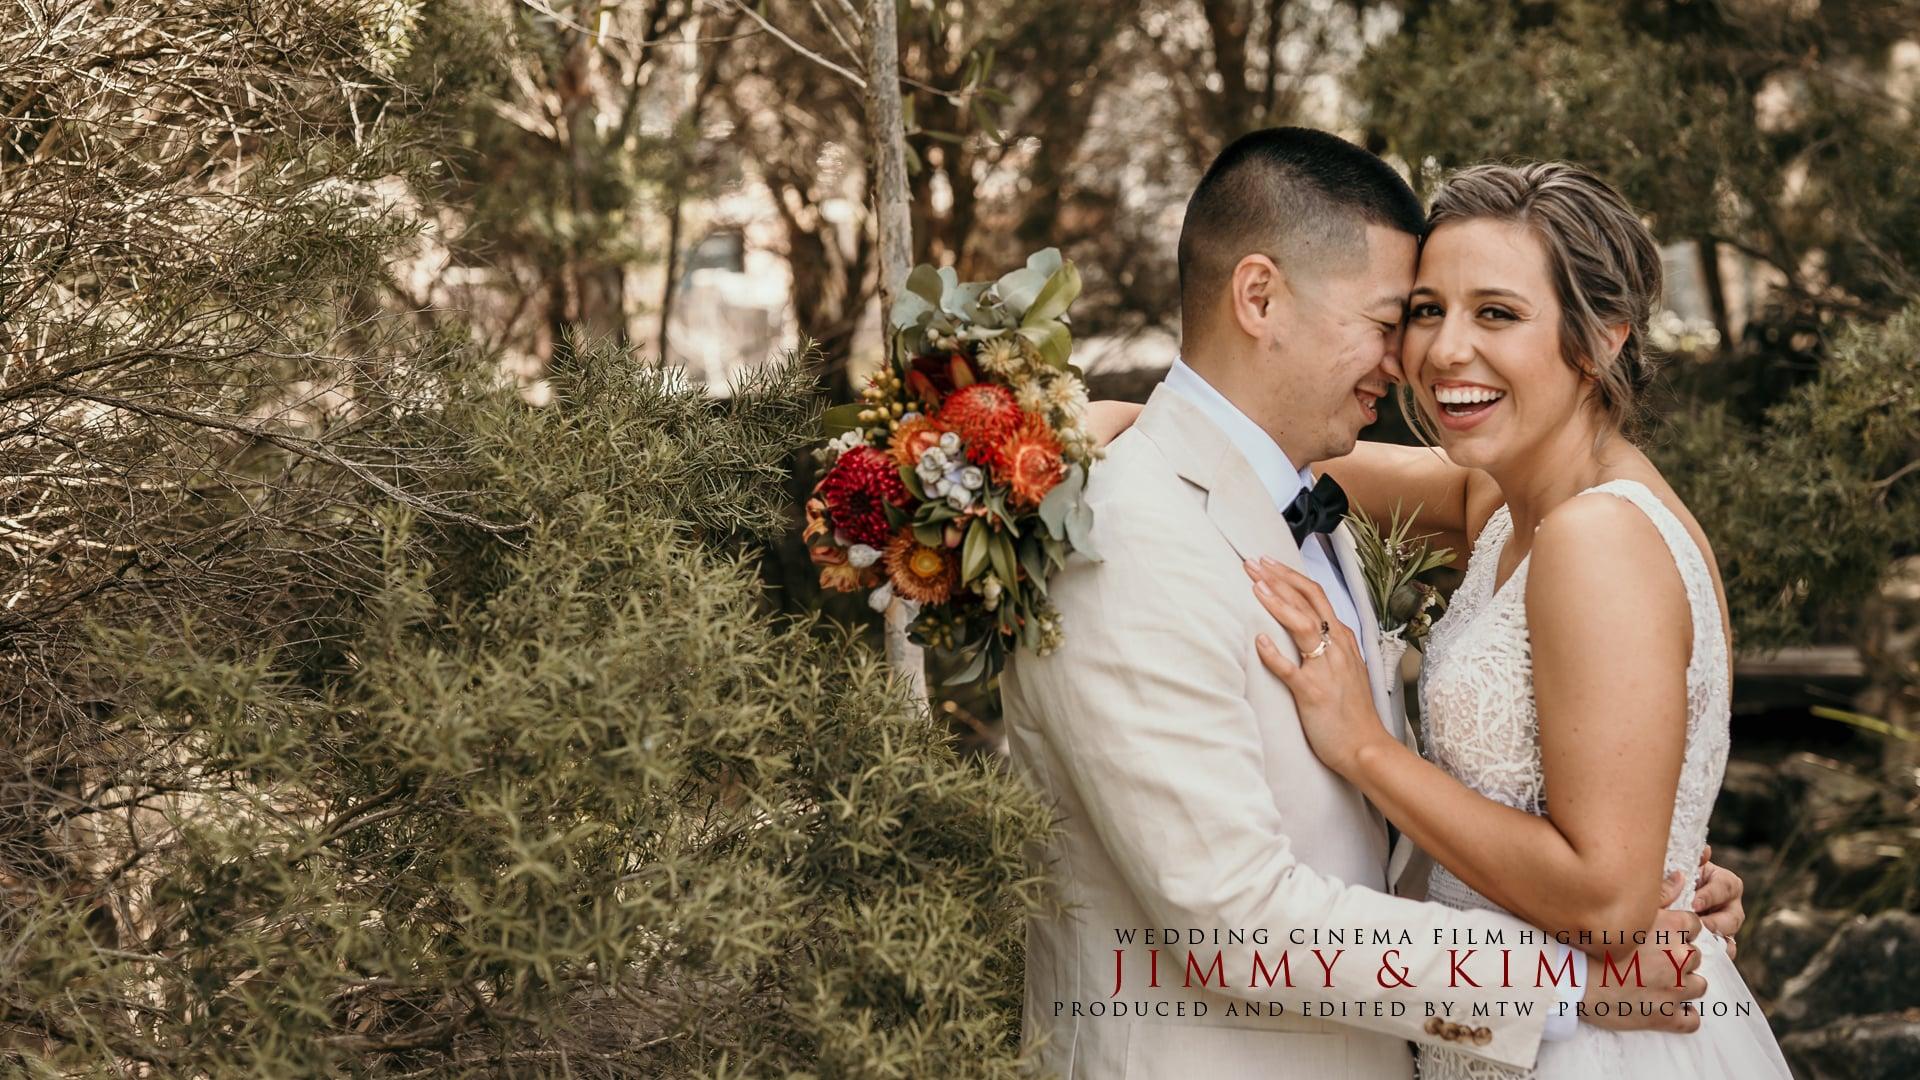 Wedding Cinema Film Highlight | Jimmy and Kimberly